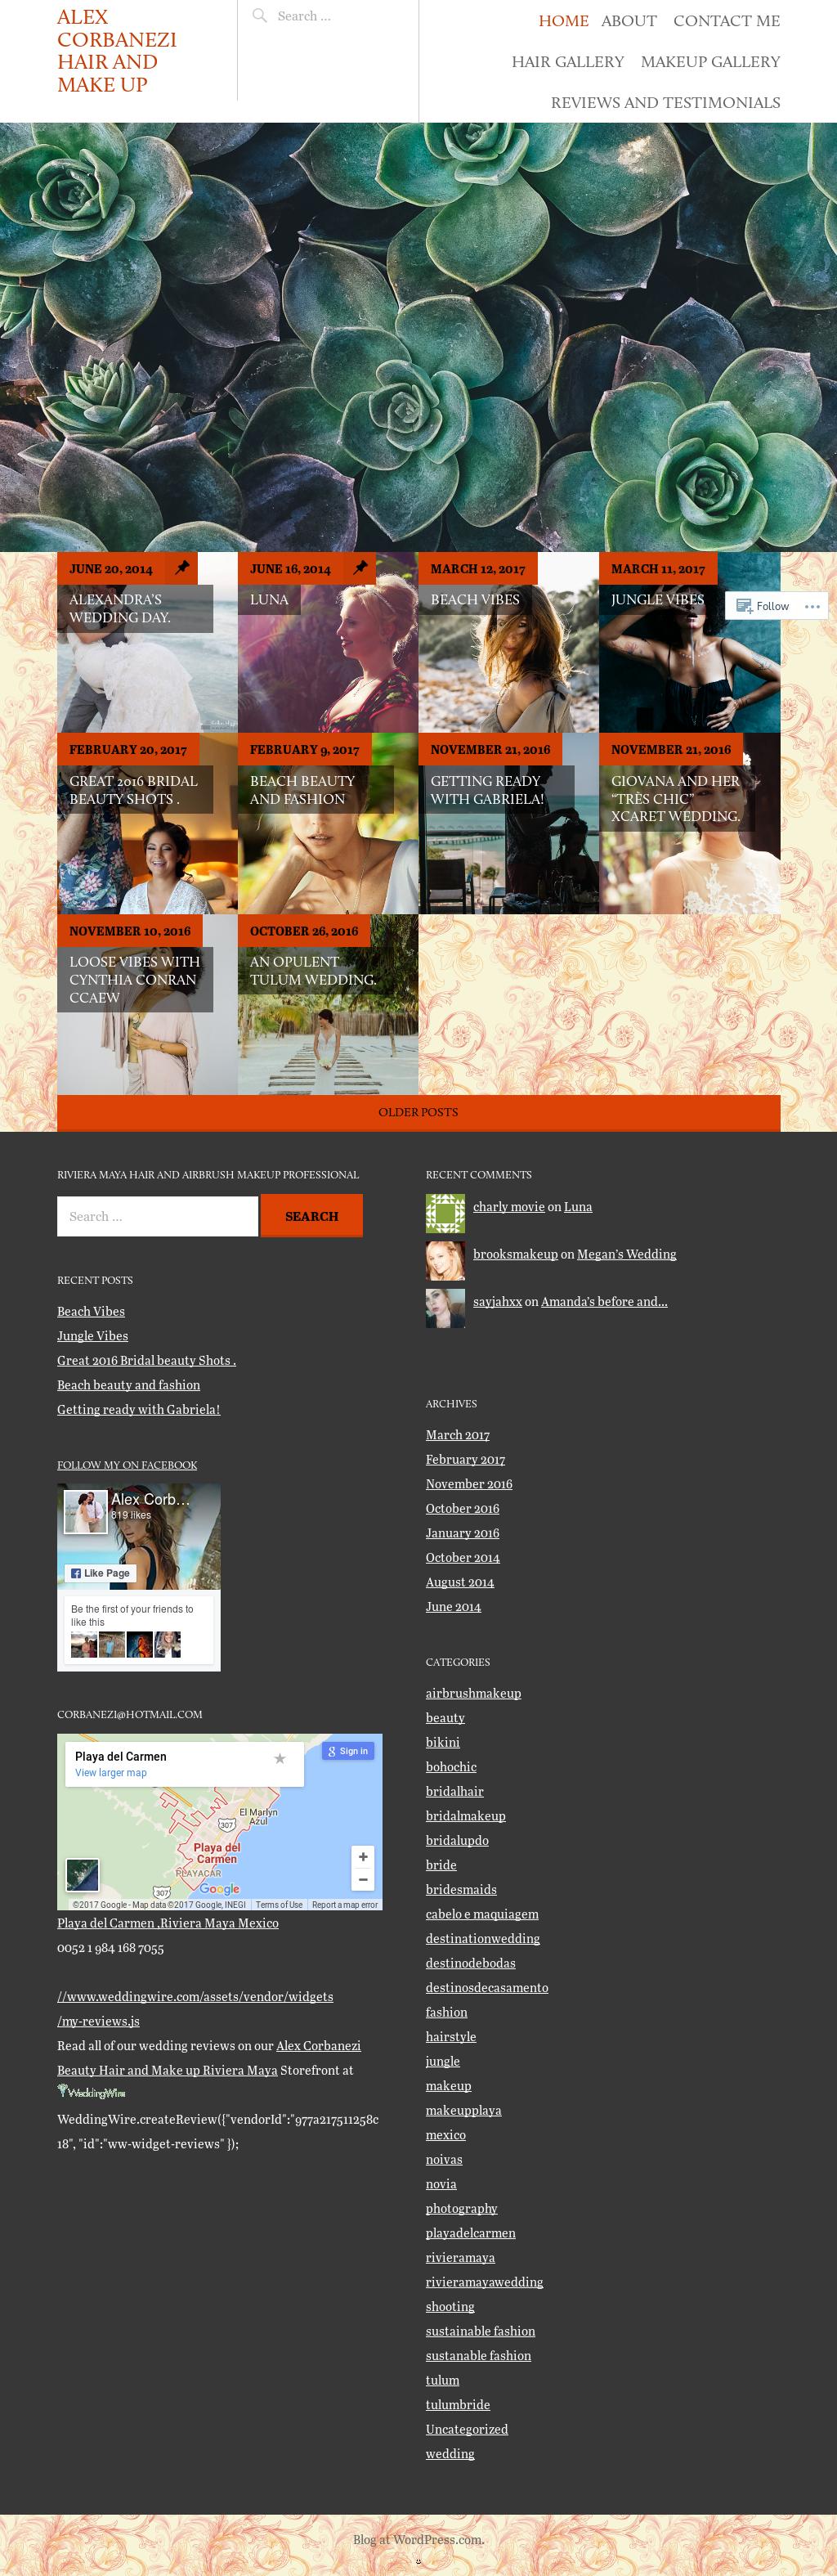 Alex Corbanezi Beauty Hair And Makeup Competitors, Revenue and ...